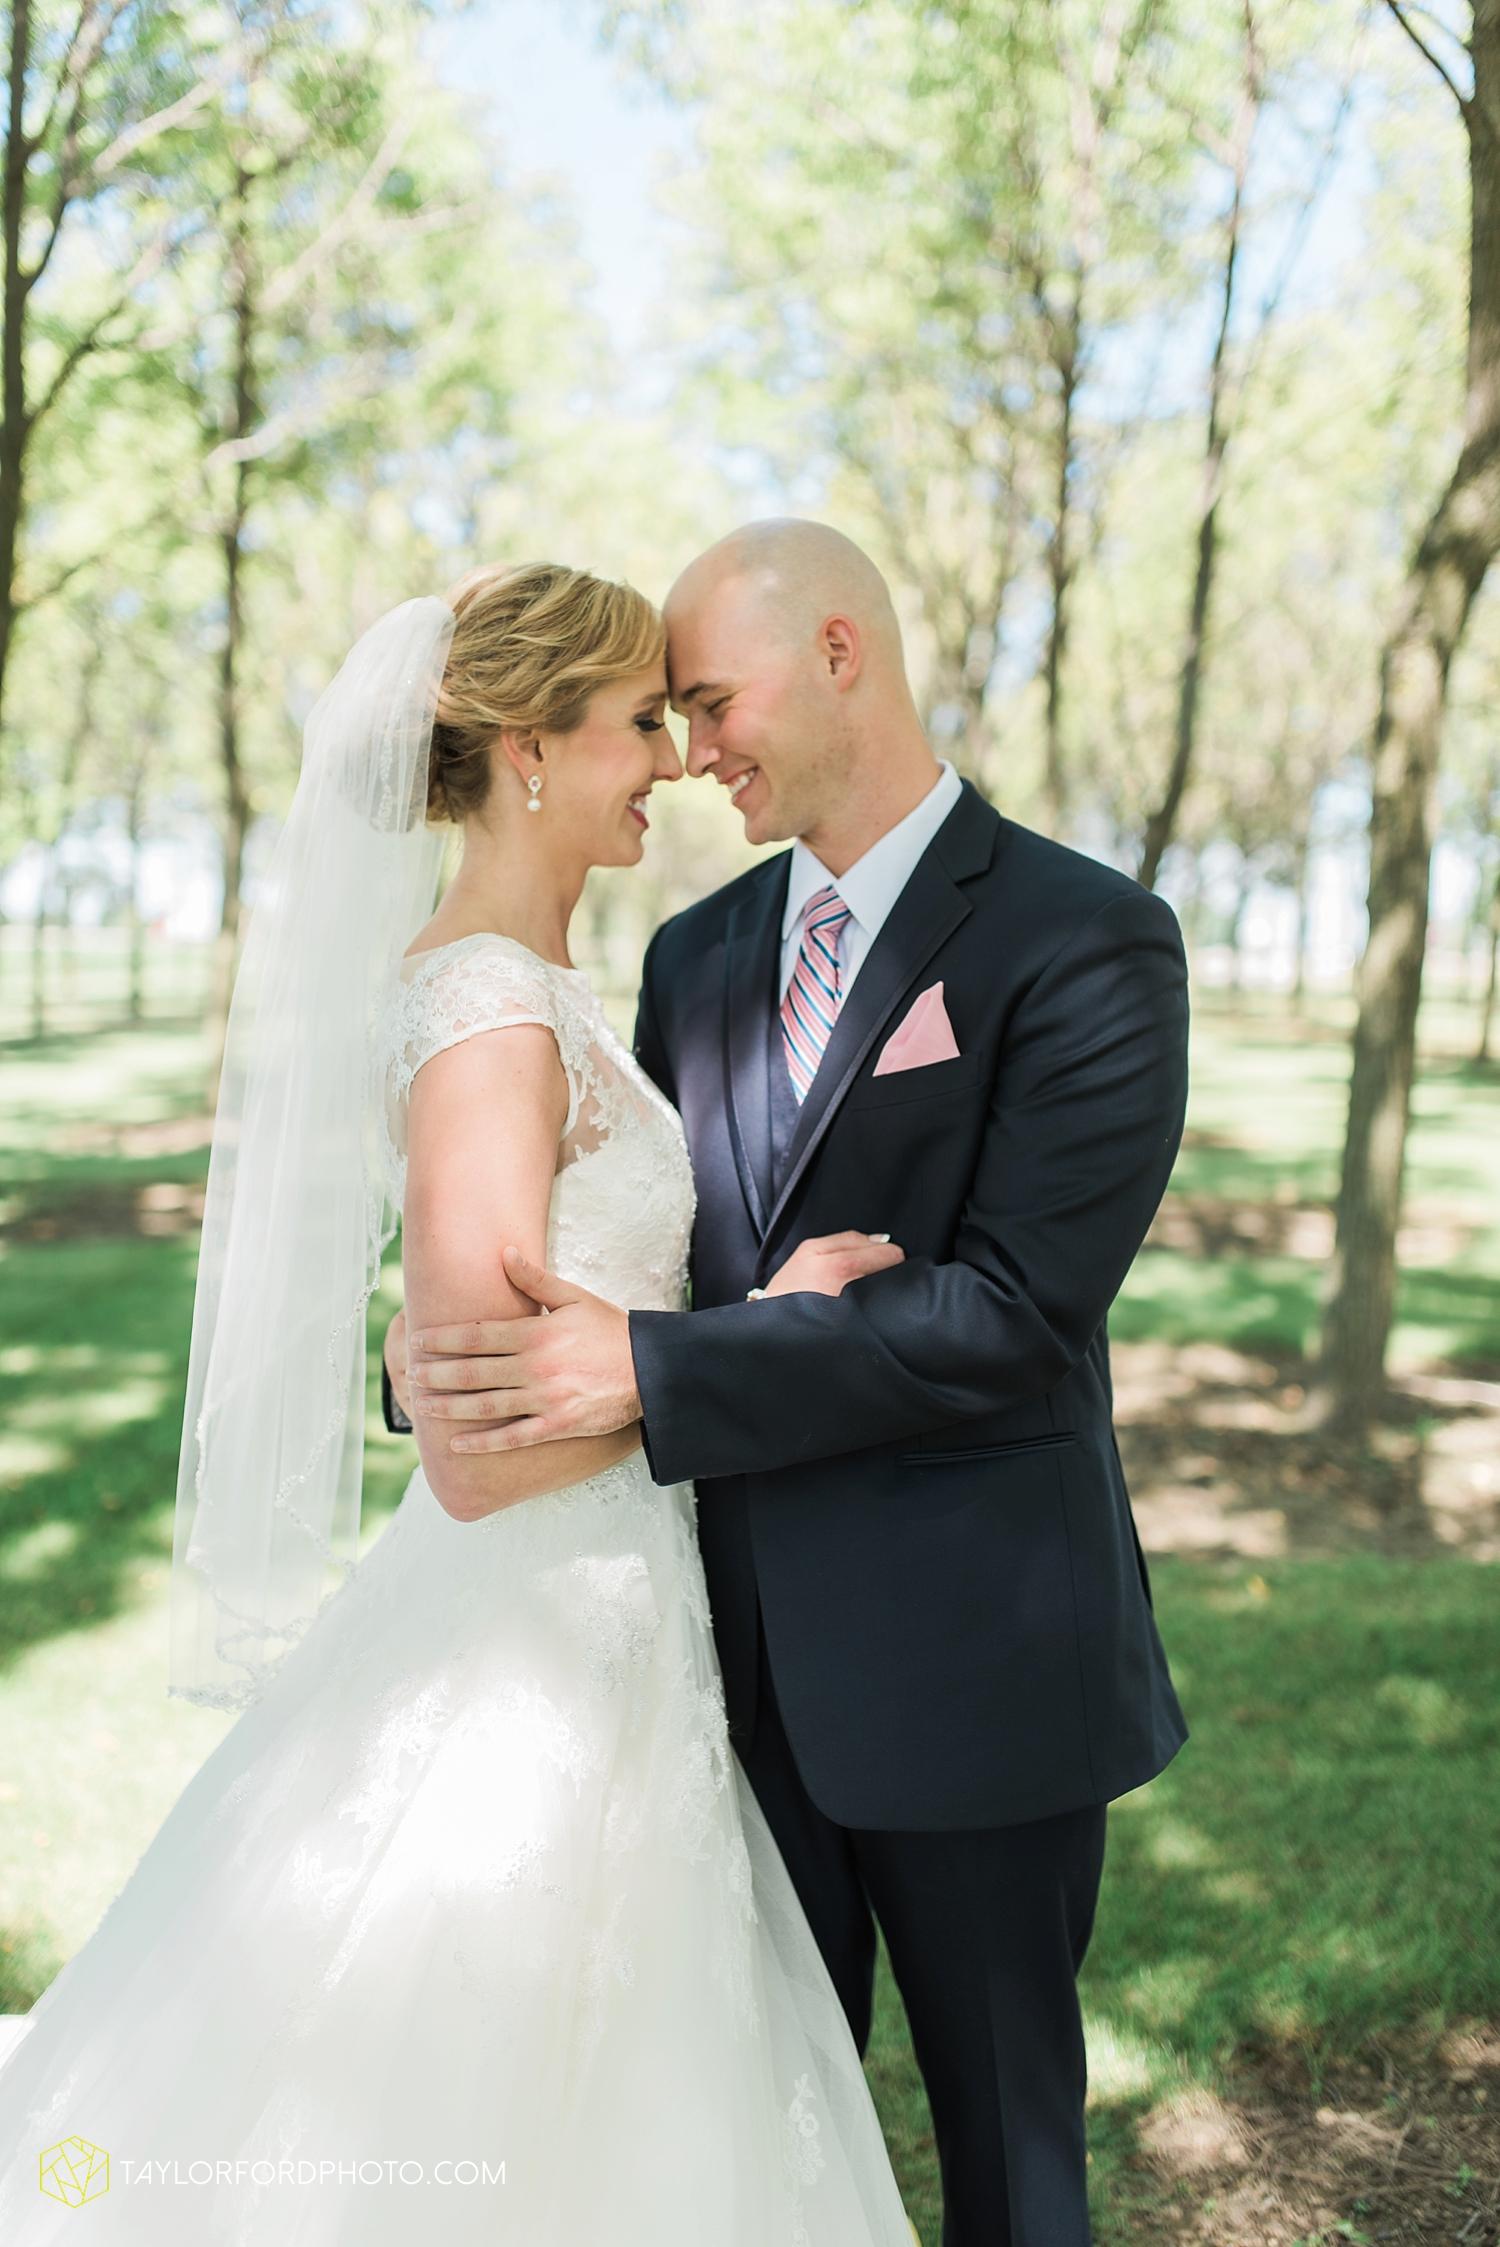 van_wert_ohio_fort_wayne_indiana__photographer_taylor_ford_nashville_tennessee_family_wedding_senior_cerutis_catering_2467.jpg